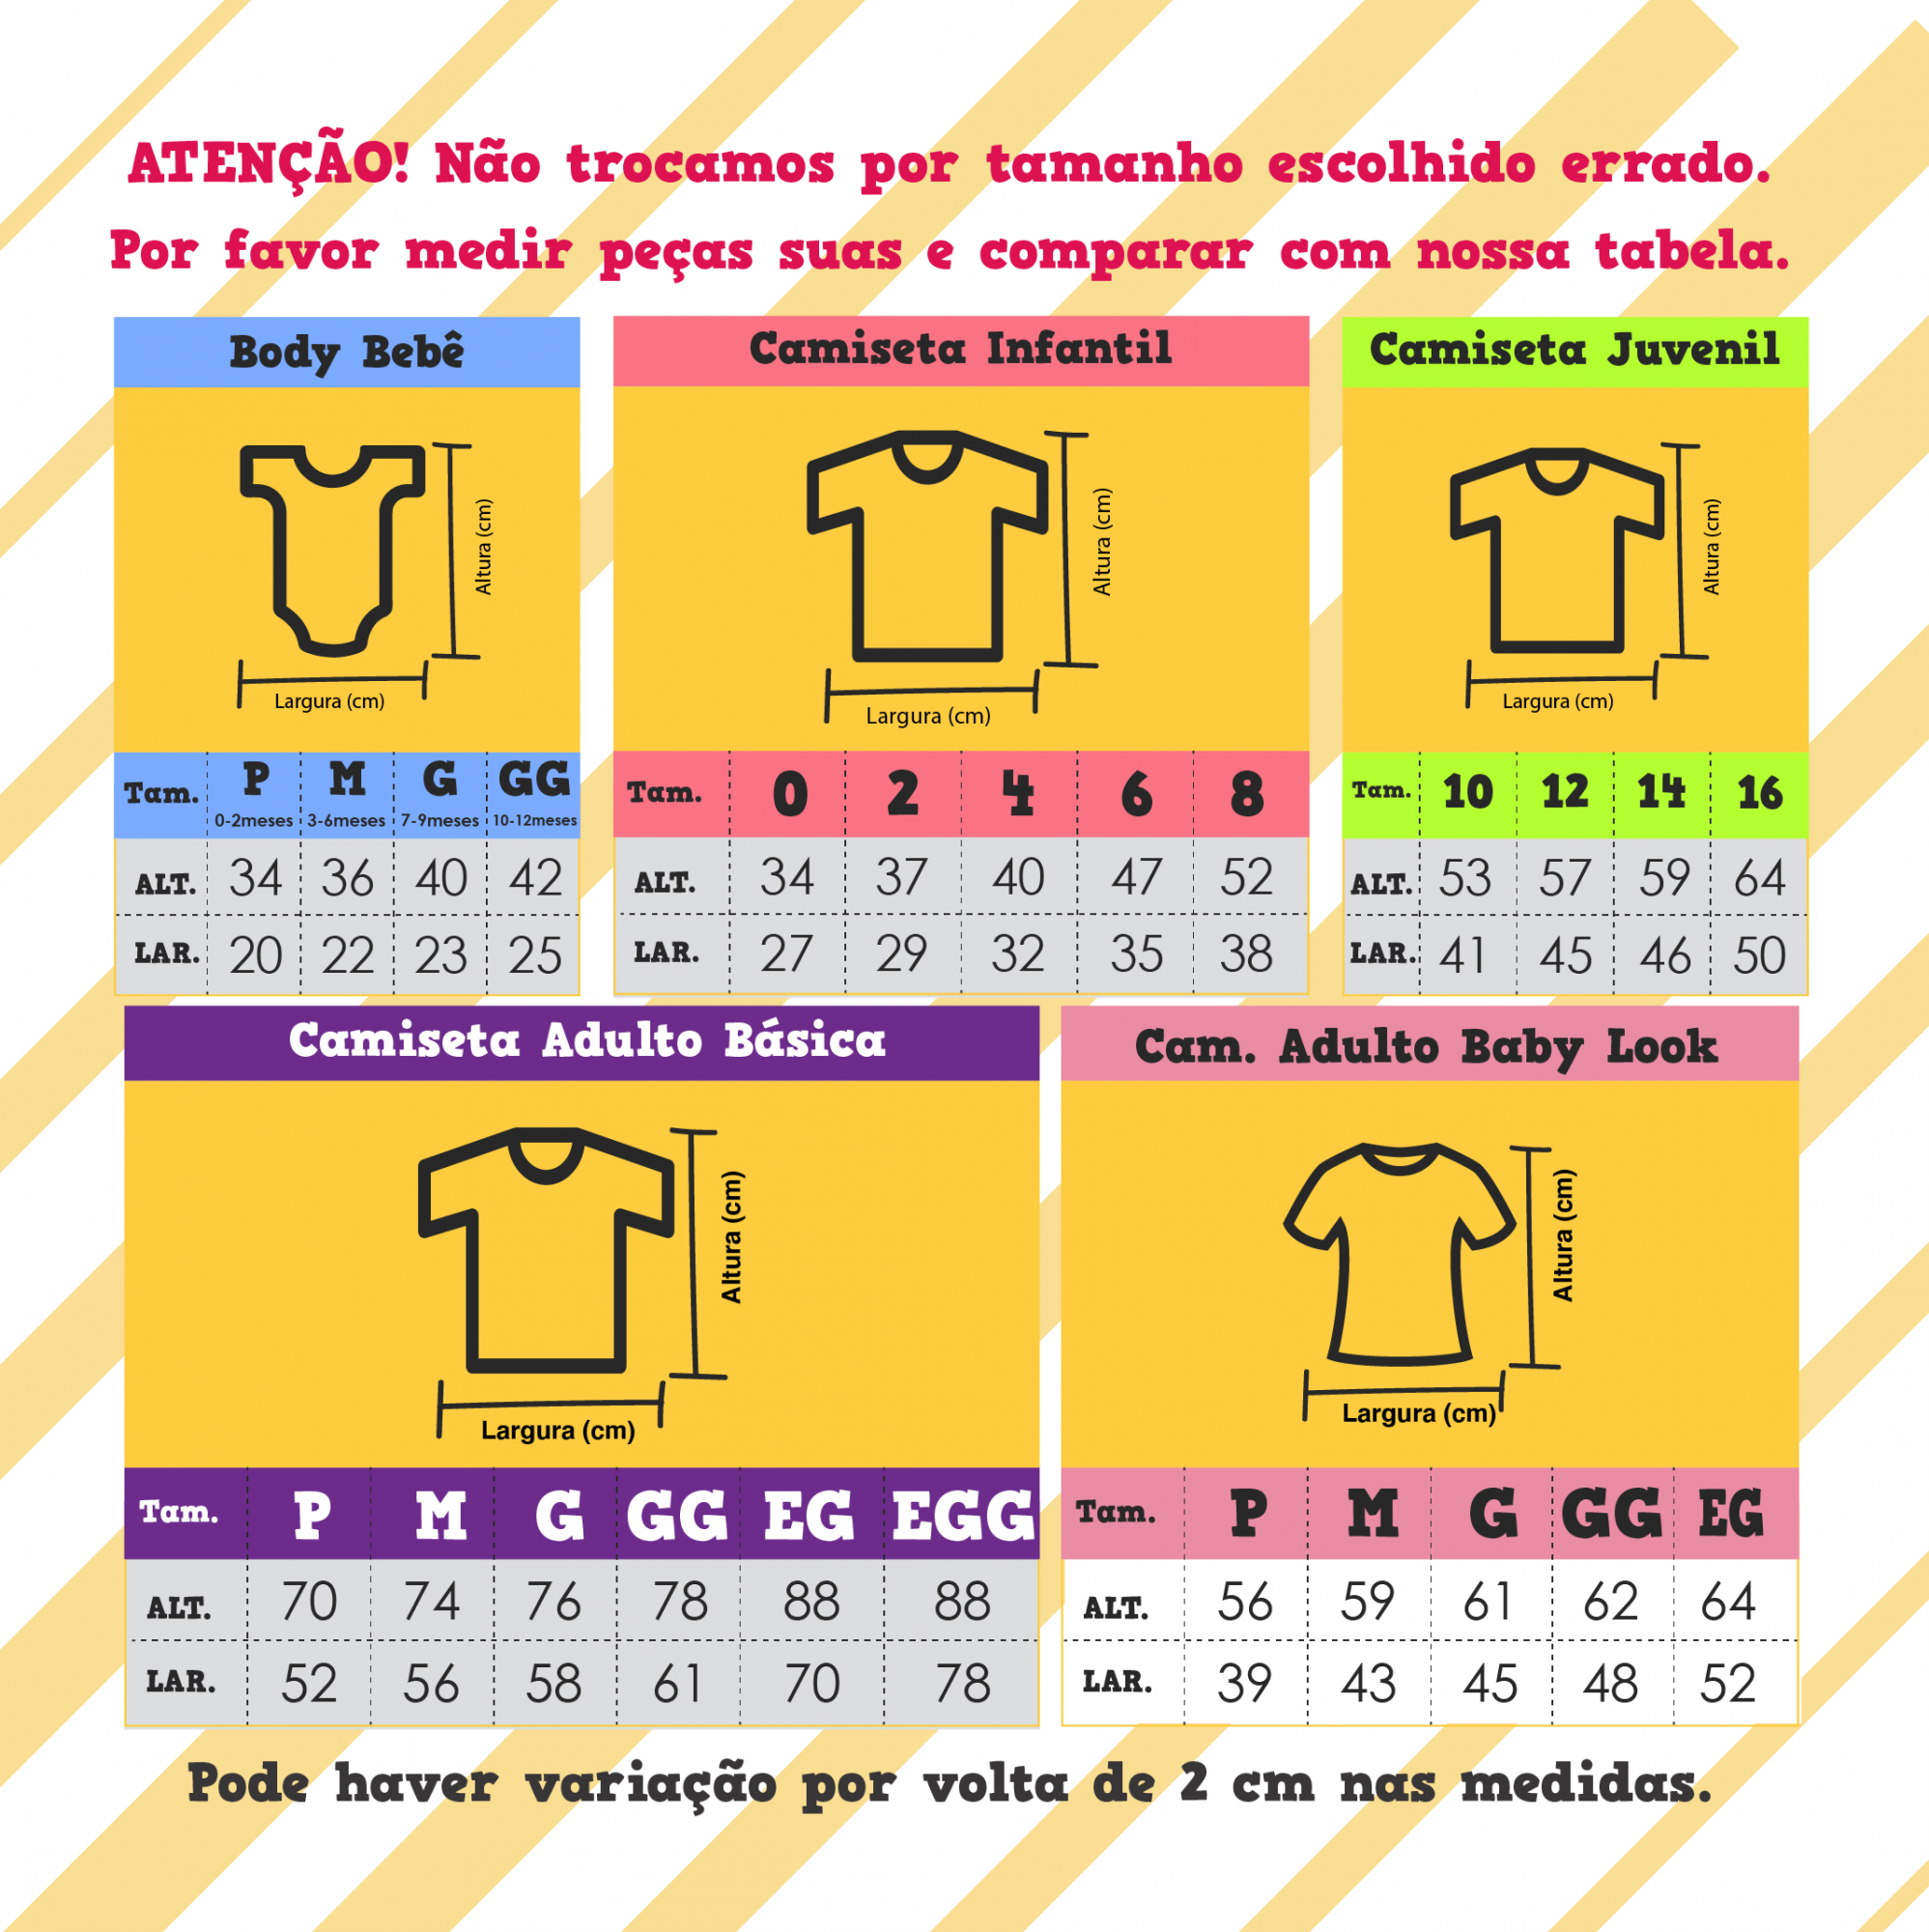 Kit De Camiseta Tal Pai Tal Mãe Tal Filho (a) - Heinz - Ketchup, Mostarda e Maionese